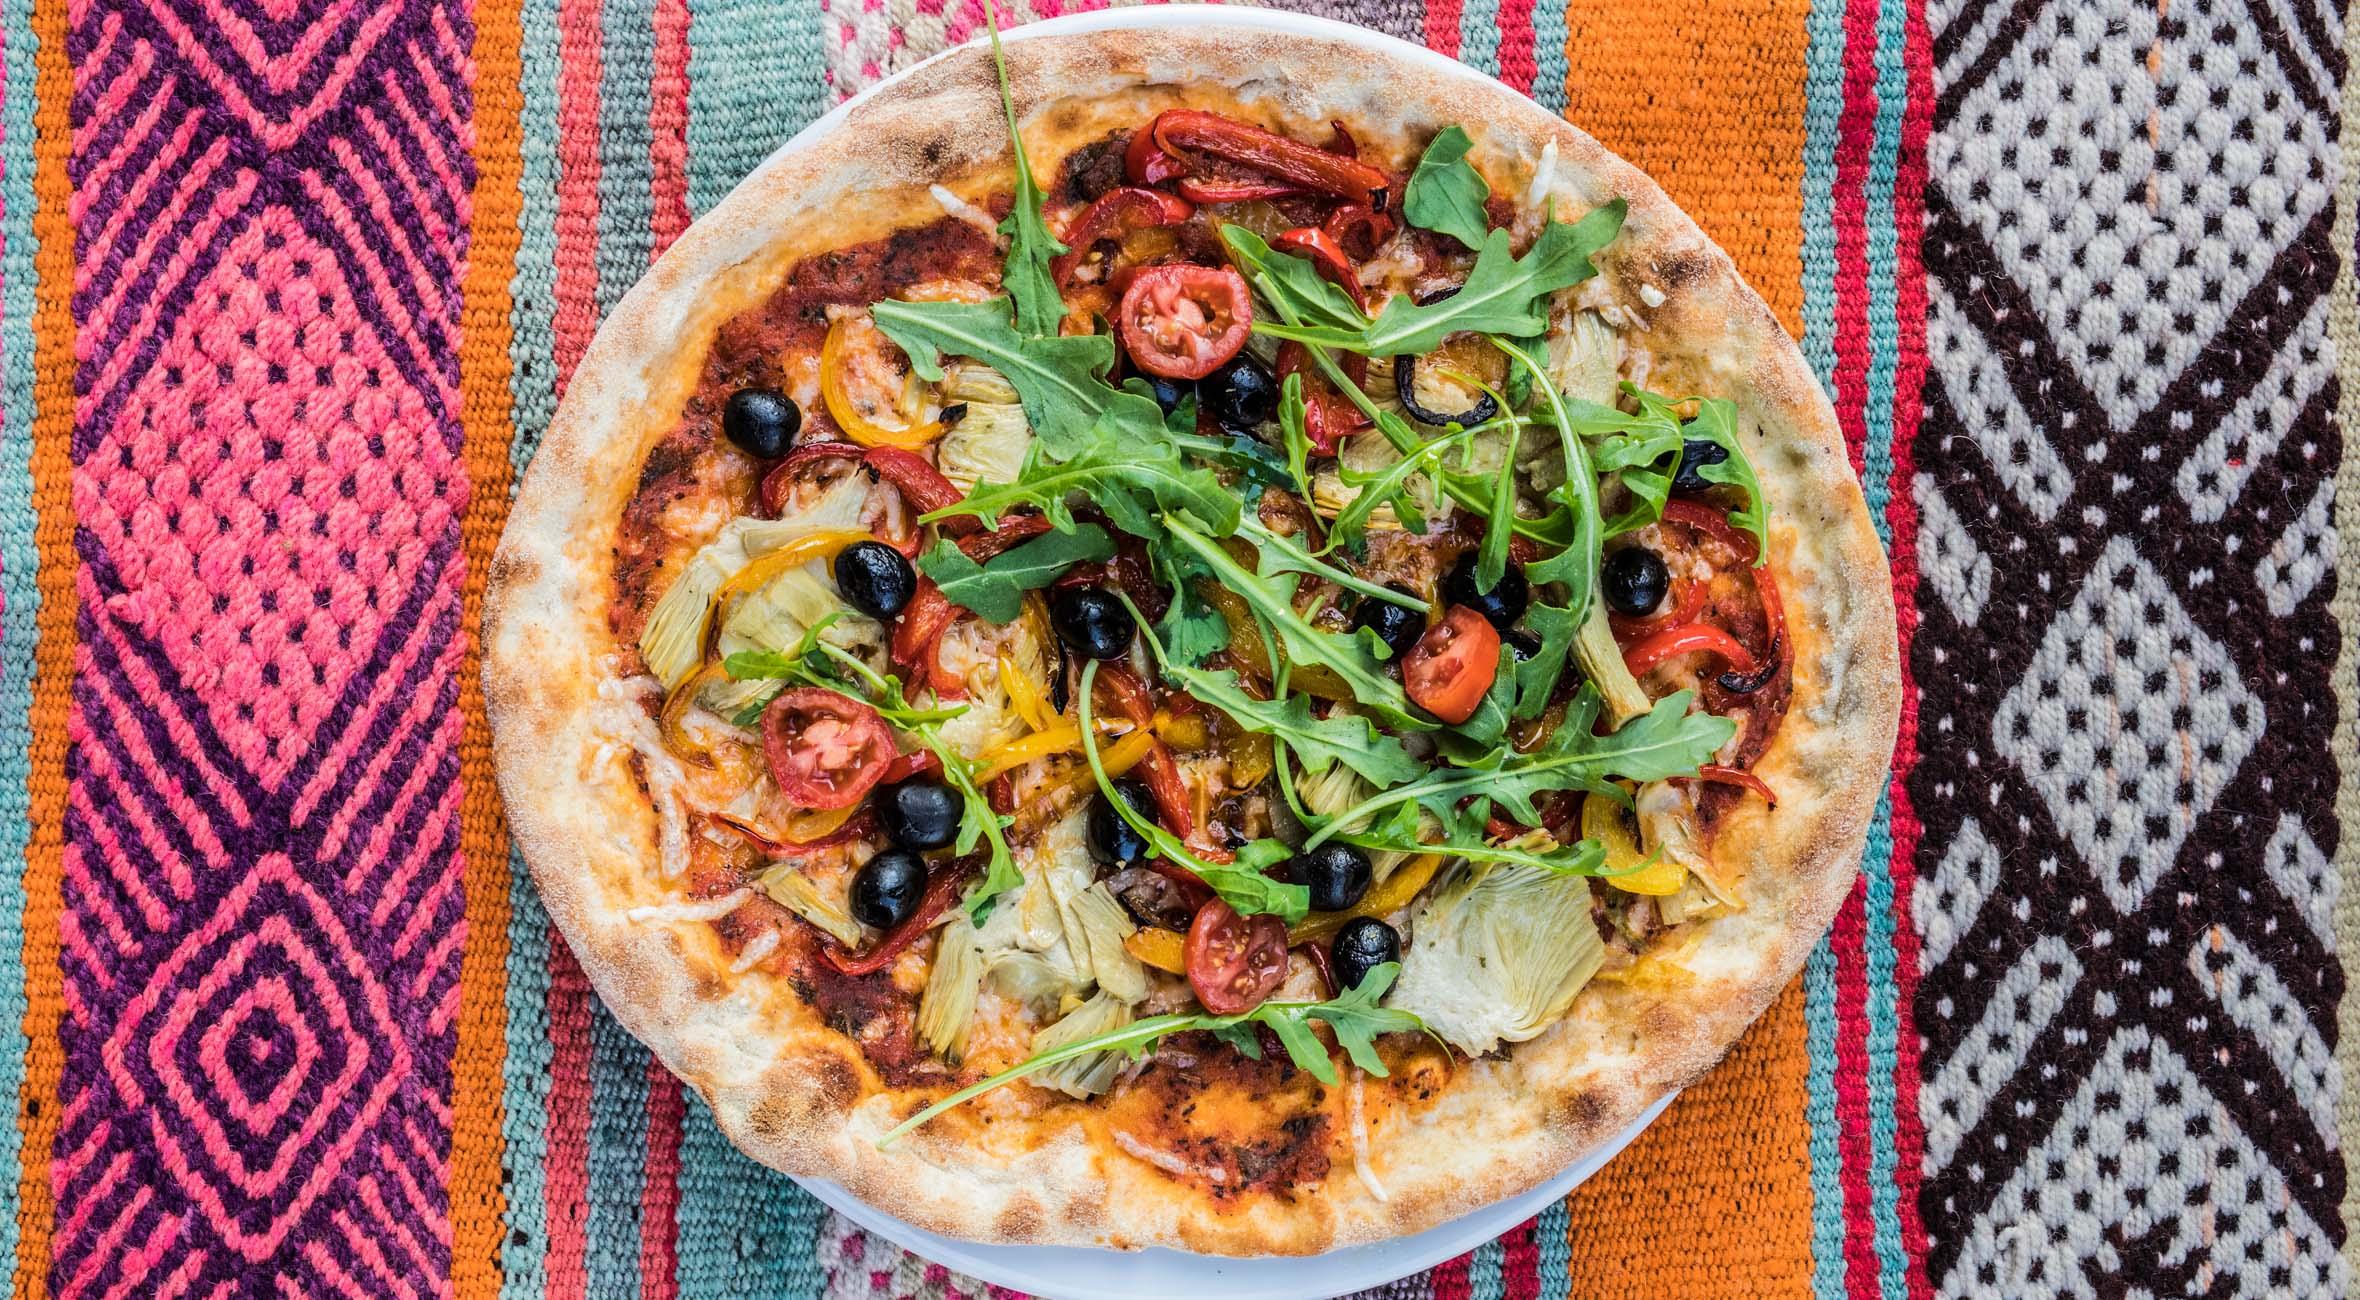 2 valgfrie pizzaer hos Plads'n i hippe Blågårdsgade – Vegansk pizza-restaurant har taget byen med storm